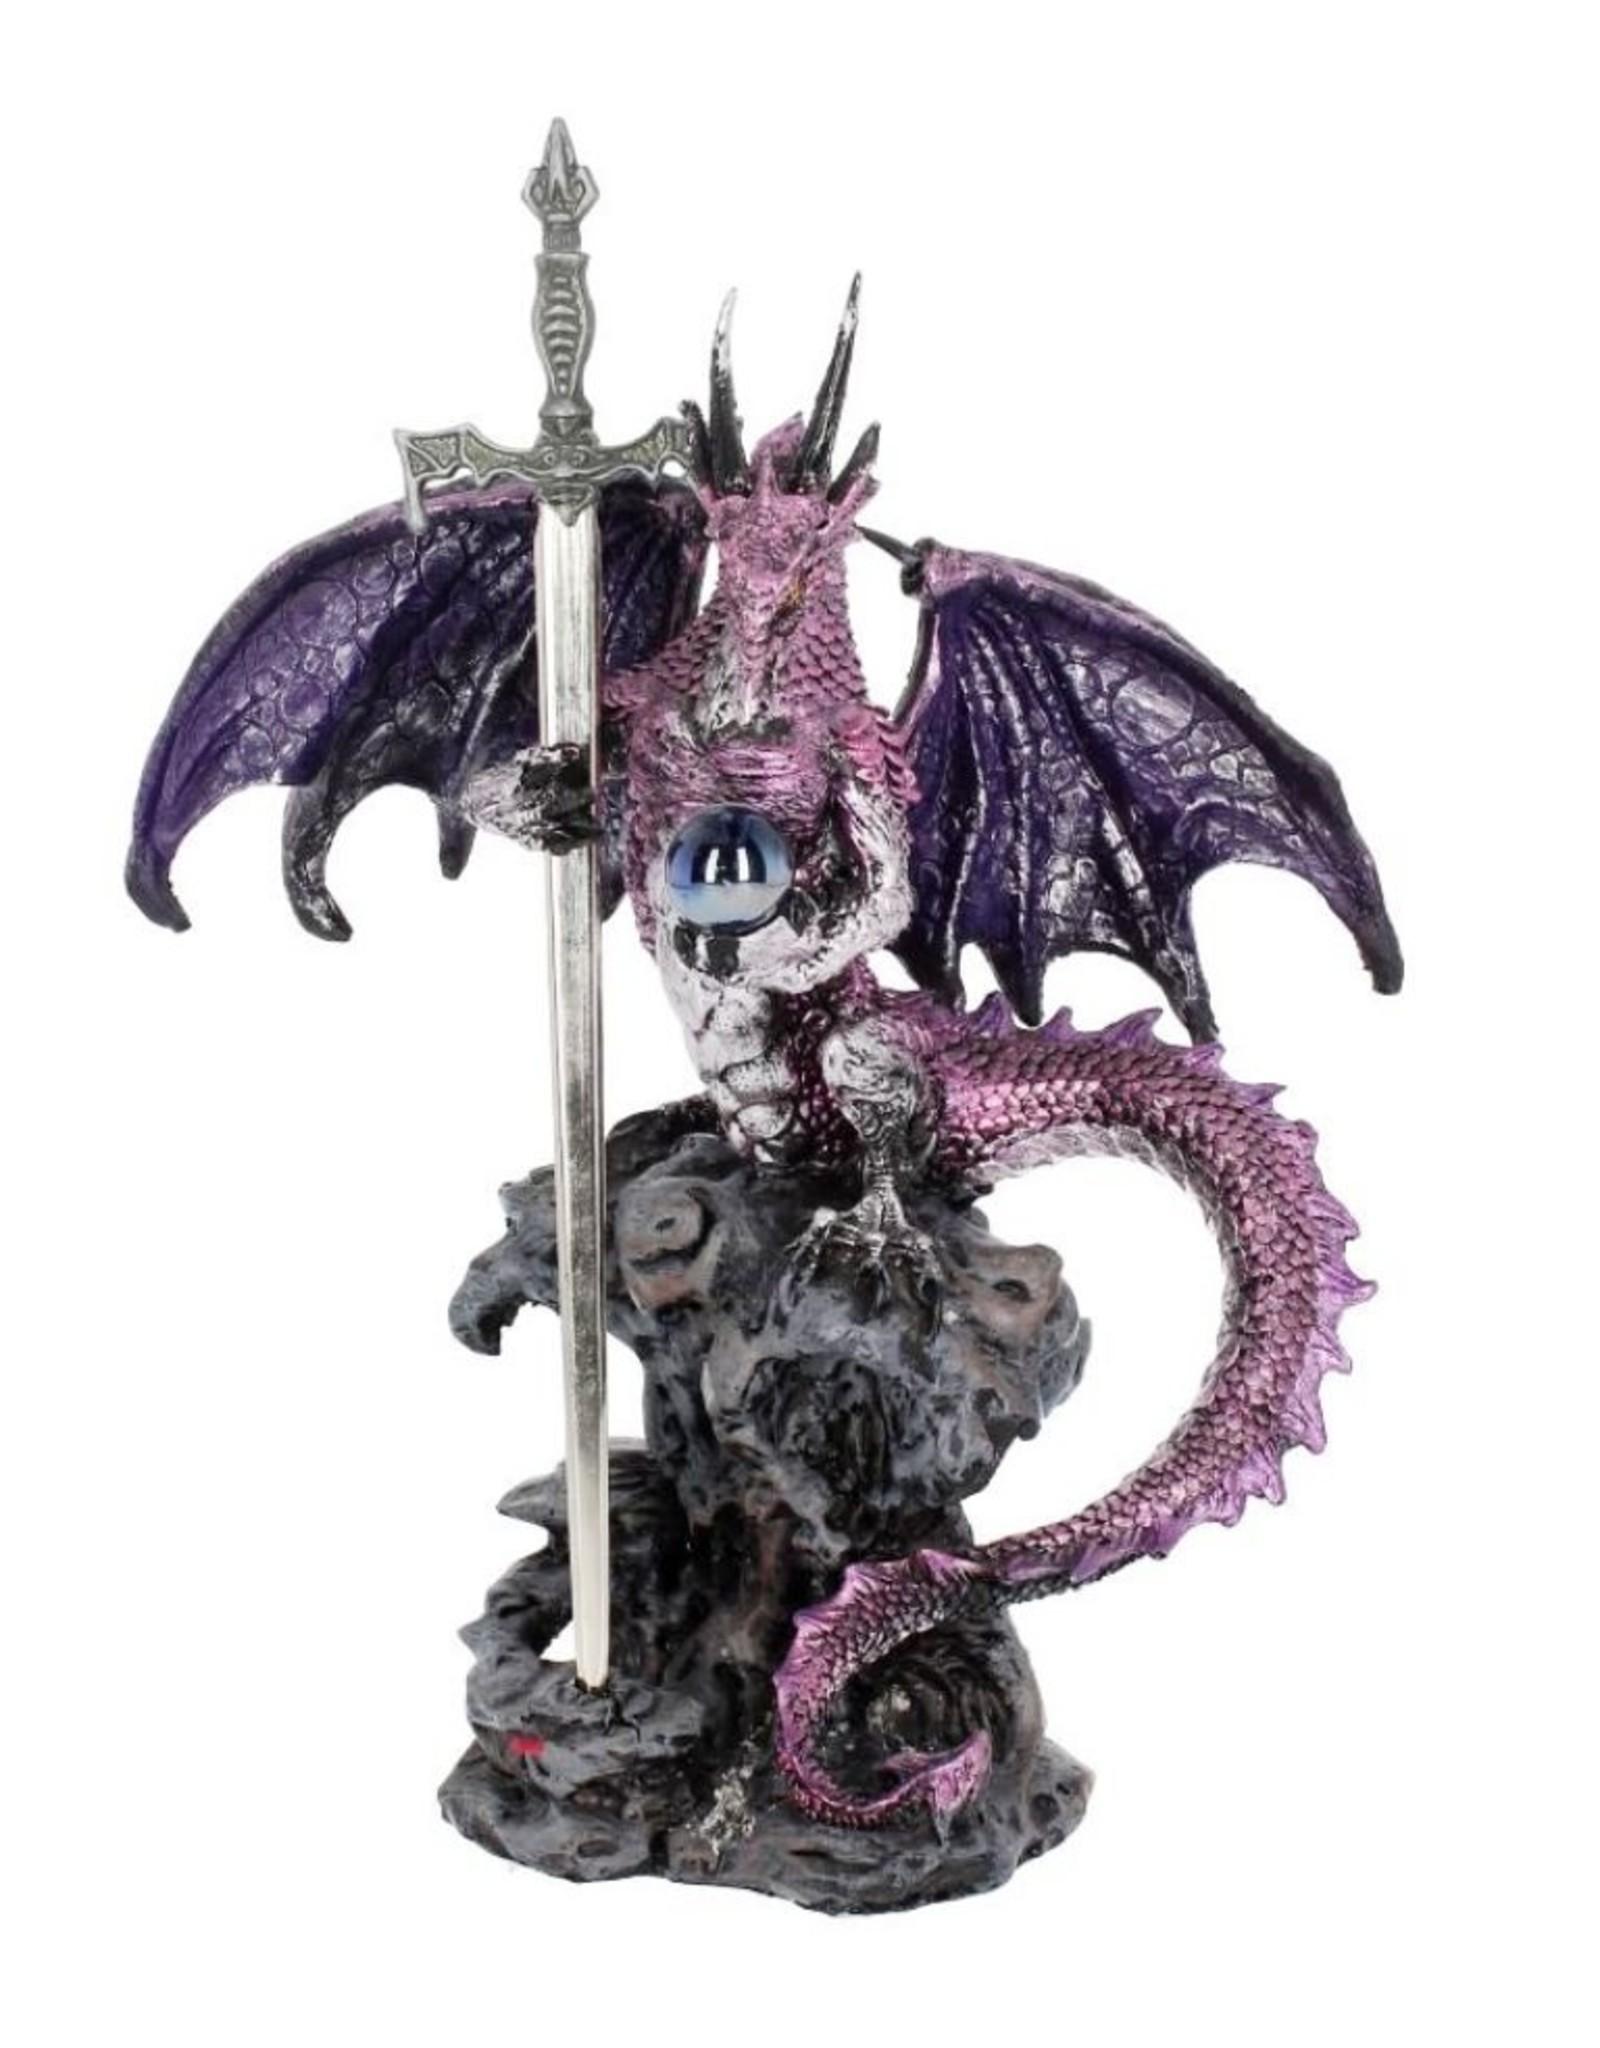 Alator Giftware & Lifestyle - Gothic Fantasy Briefopener Dragon Blade